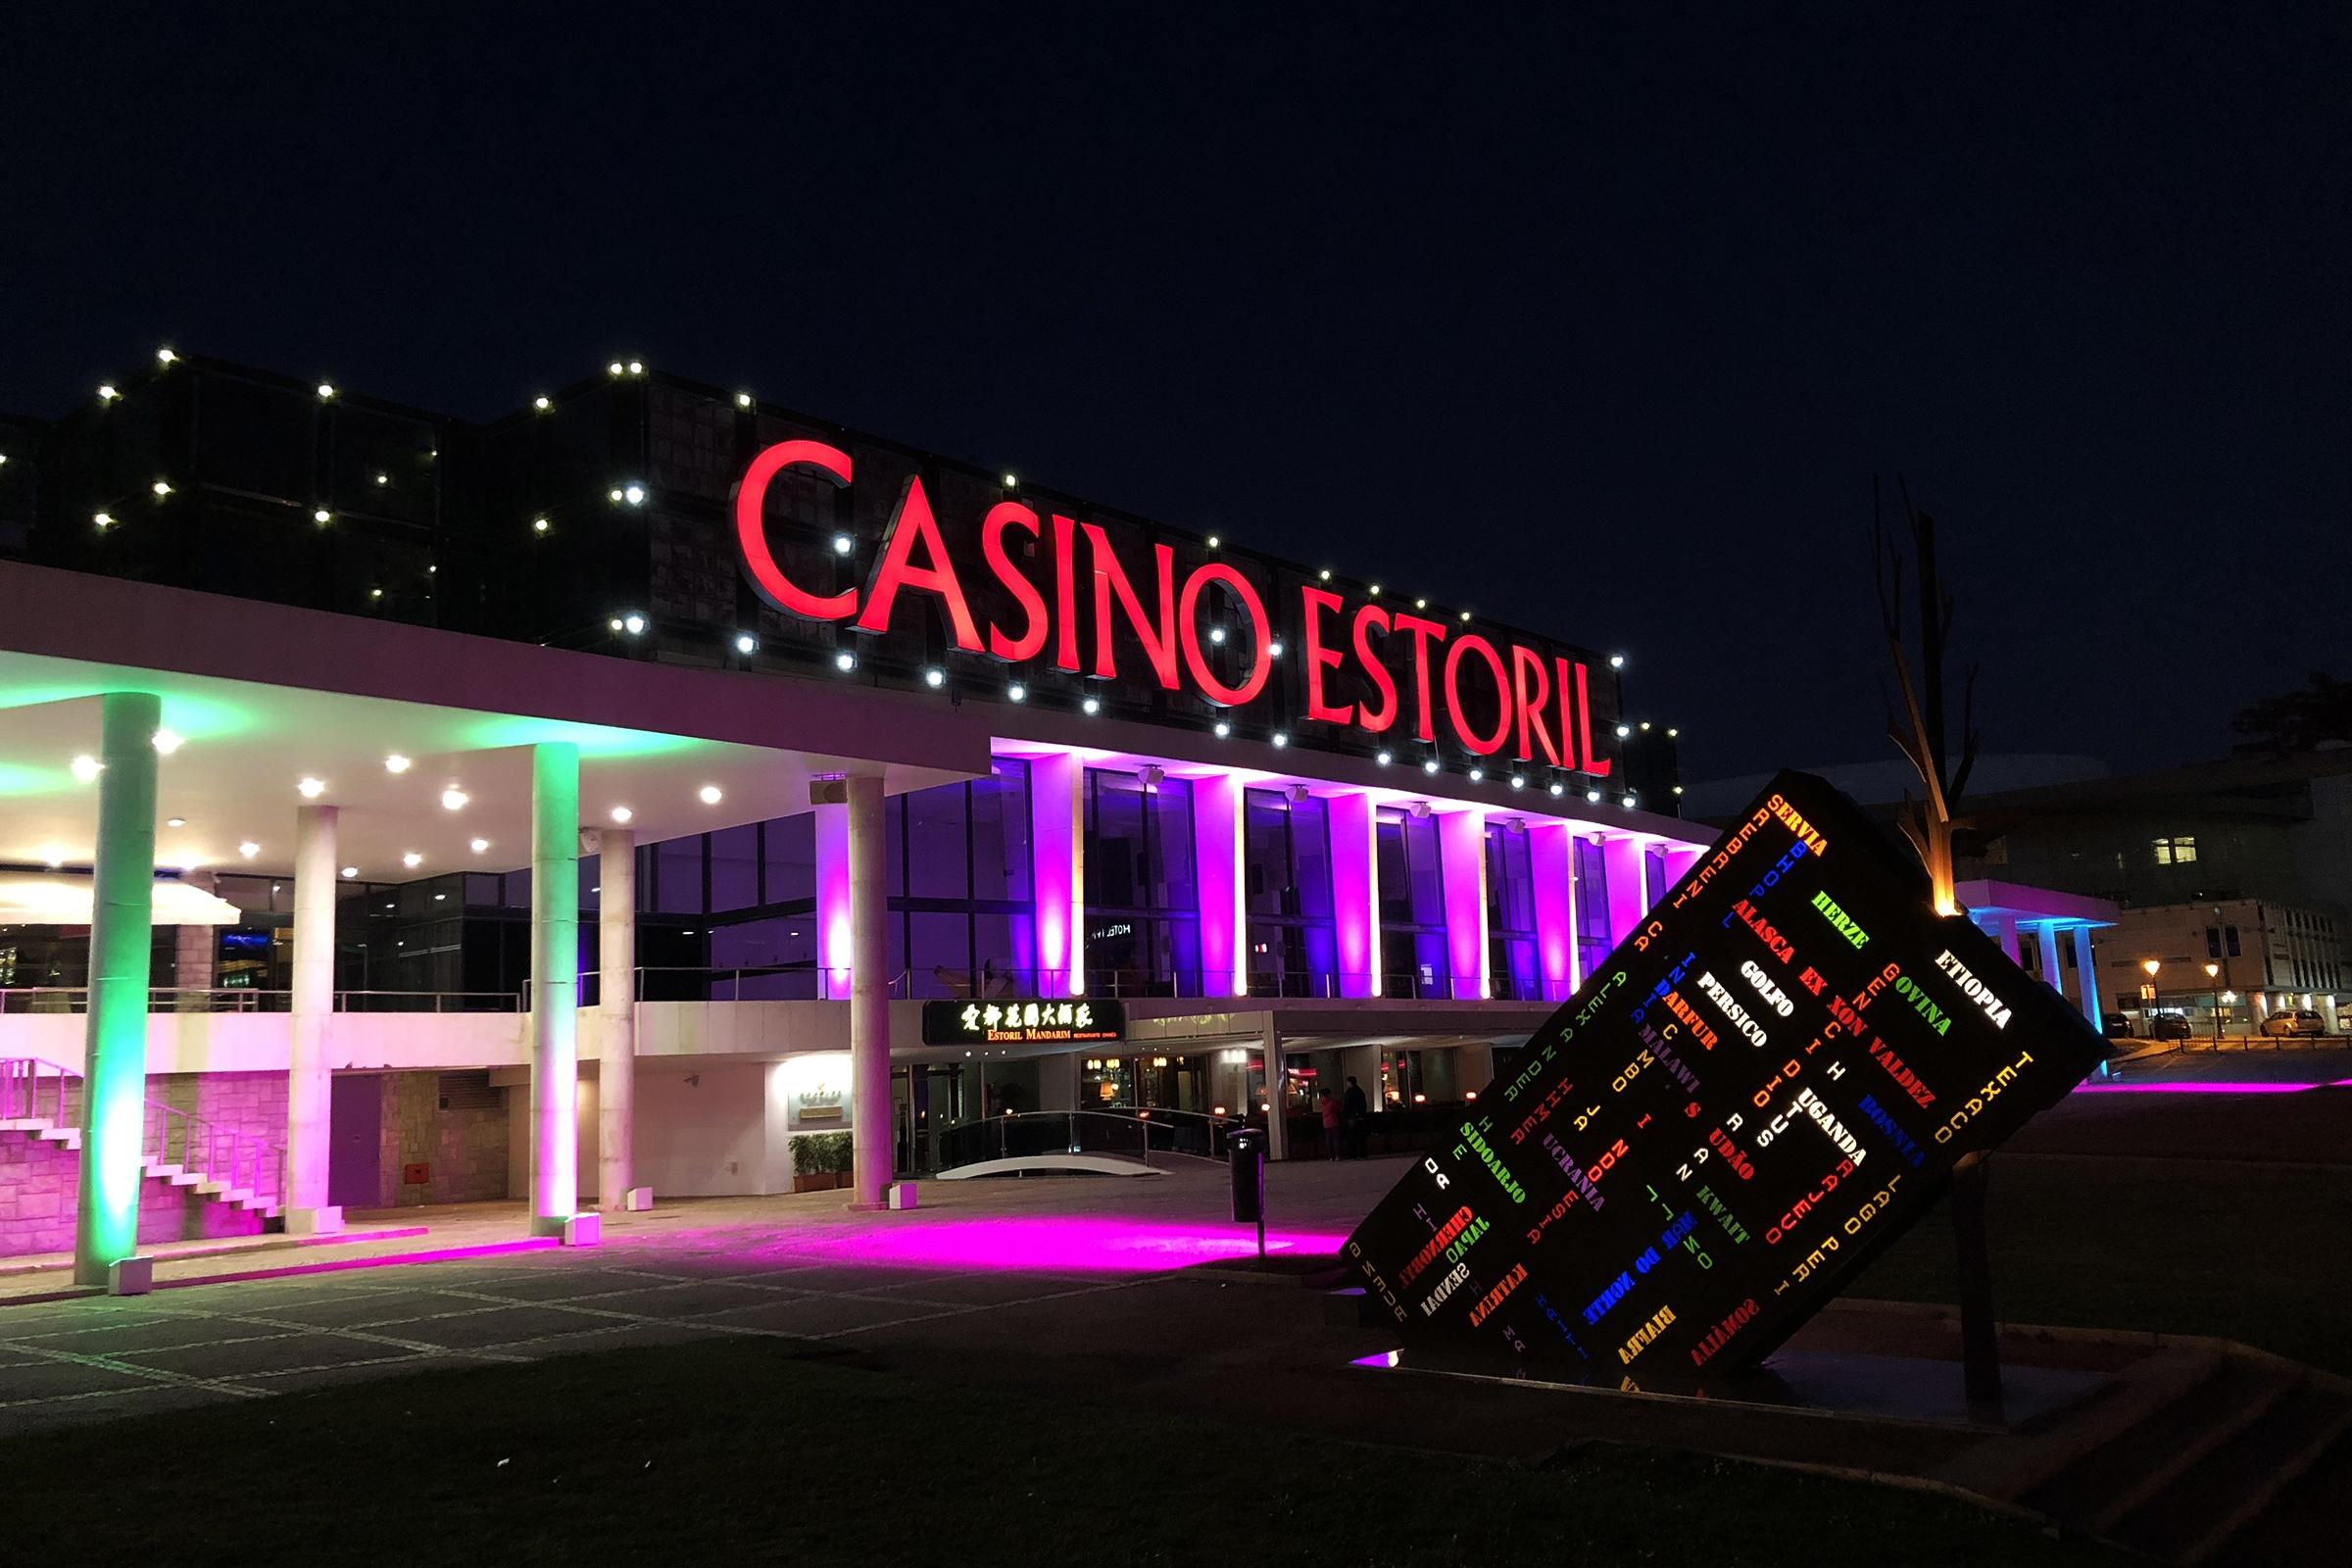 (Casino Estoril at night, Feb. 21, 2018. Photo credit: Lee Ferran)